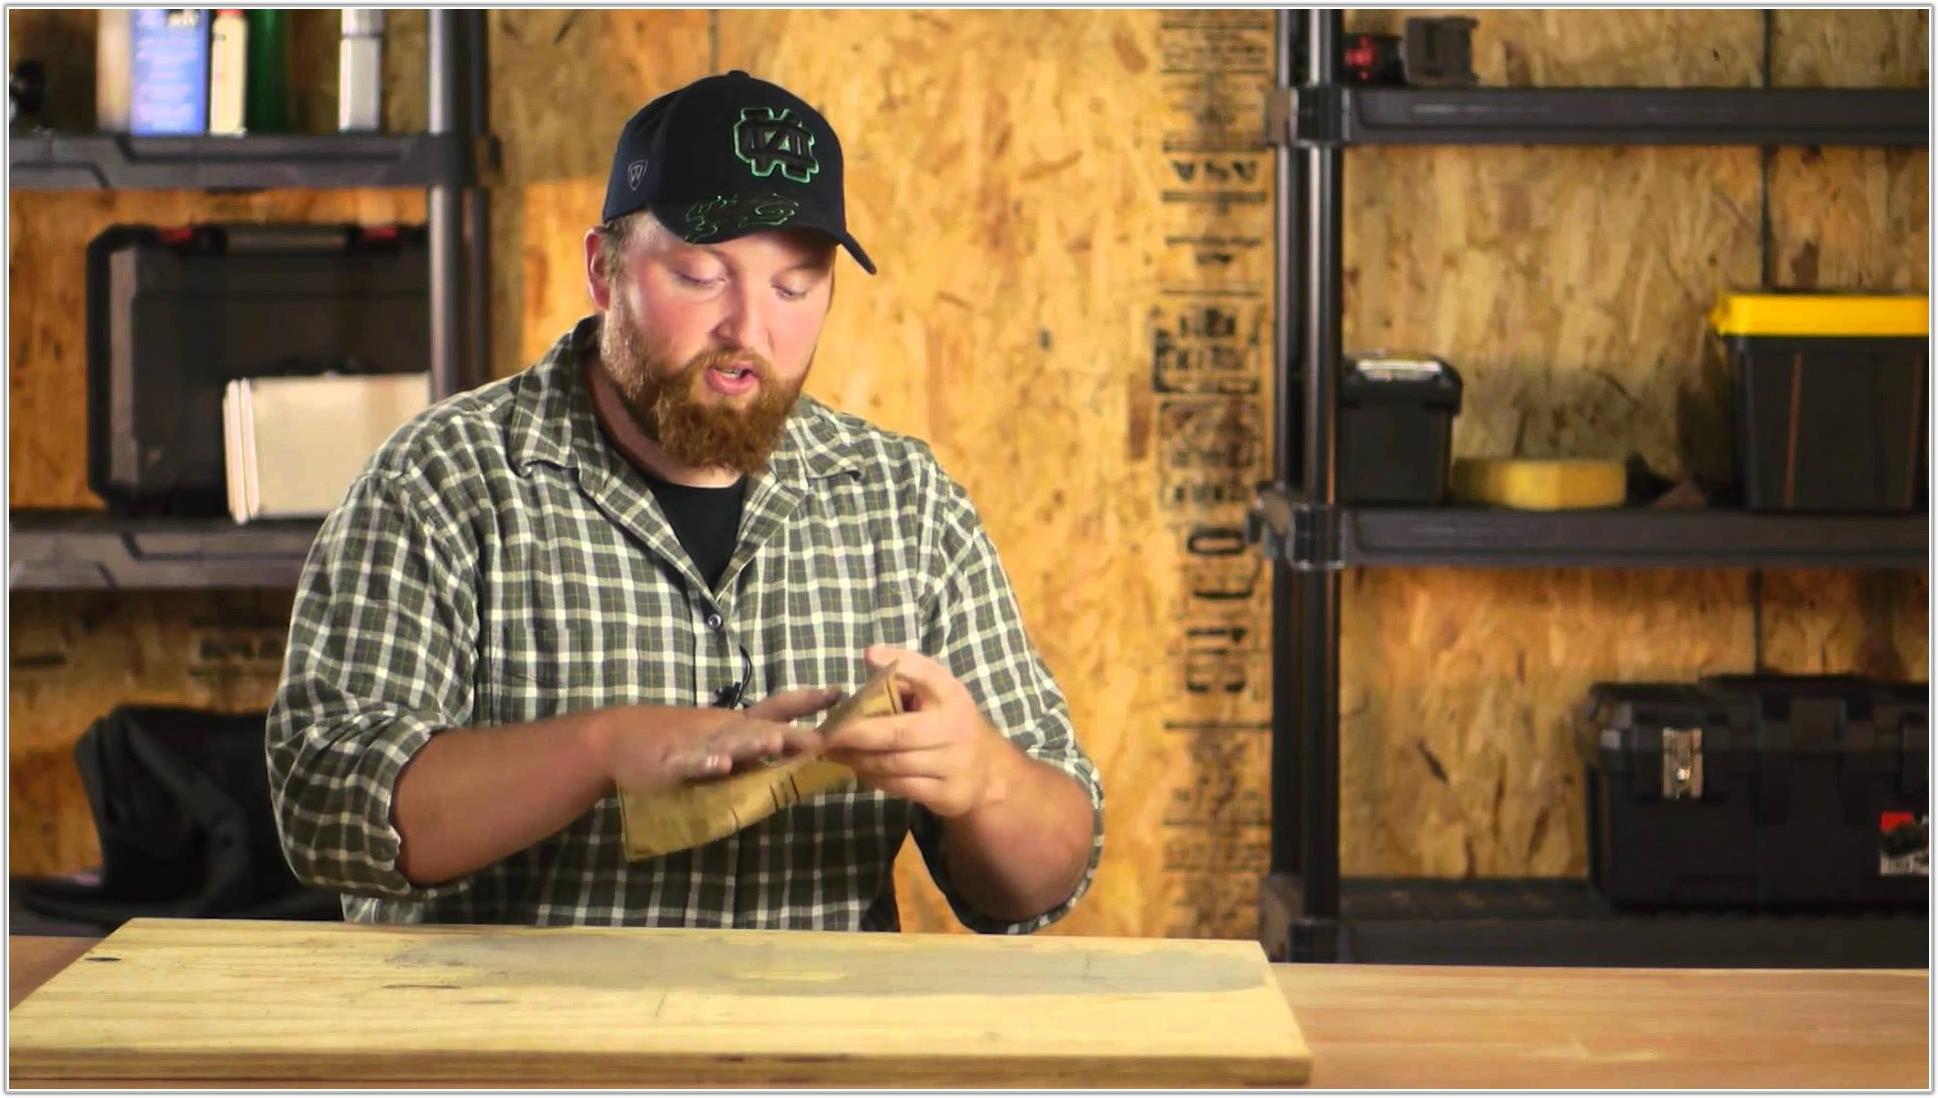 Removing Ceramic Tile Floor Mortar